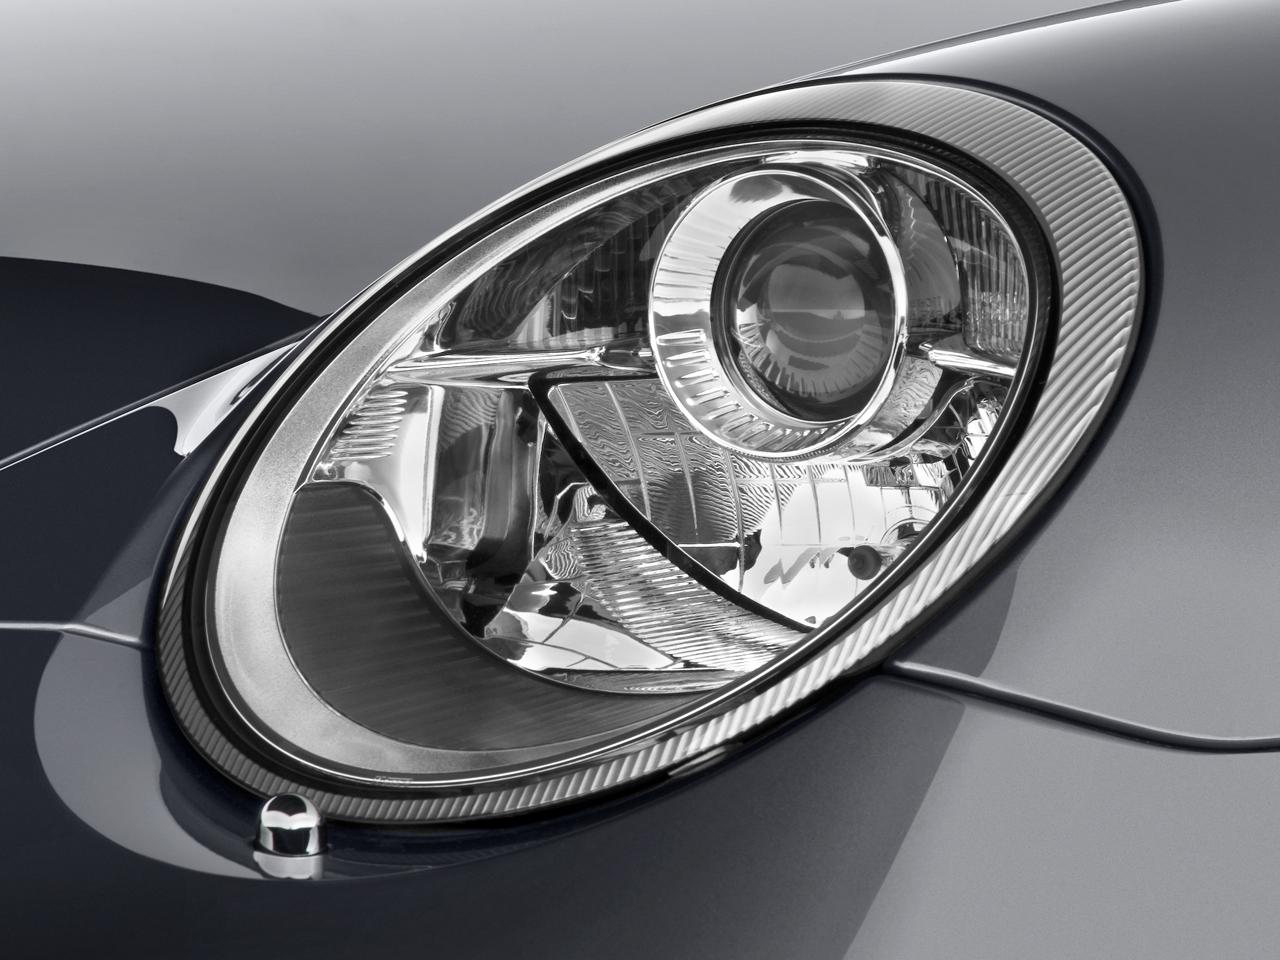 Derek Bell On Porsches New Pdk Dual Clutch Transmission Latest Porsche Diagrams 64 150